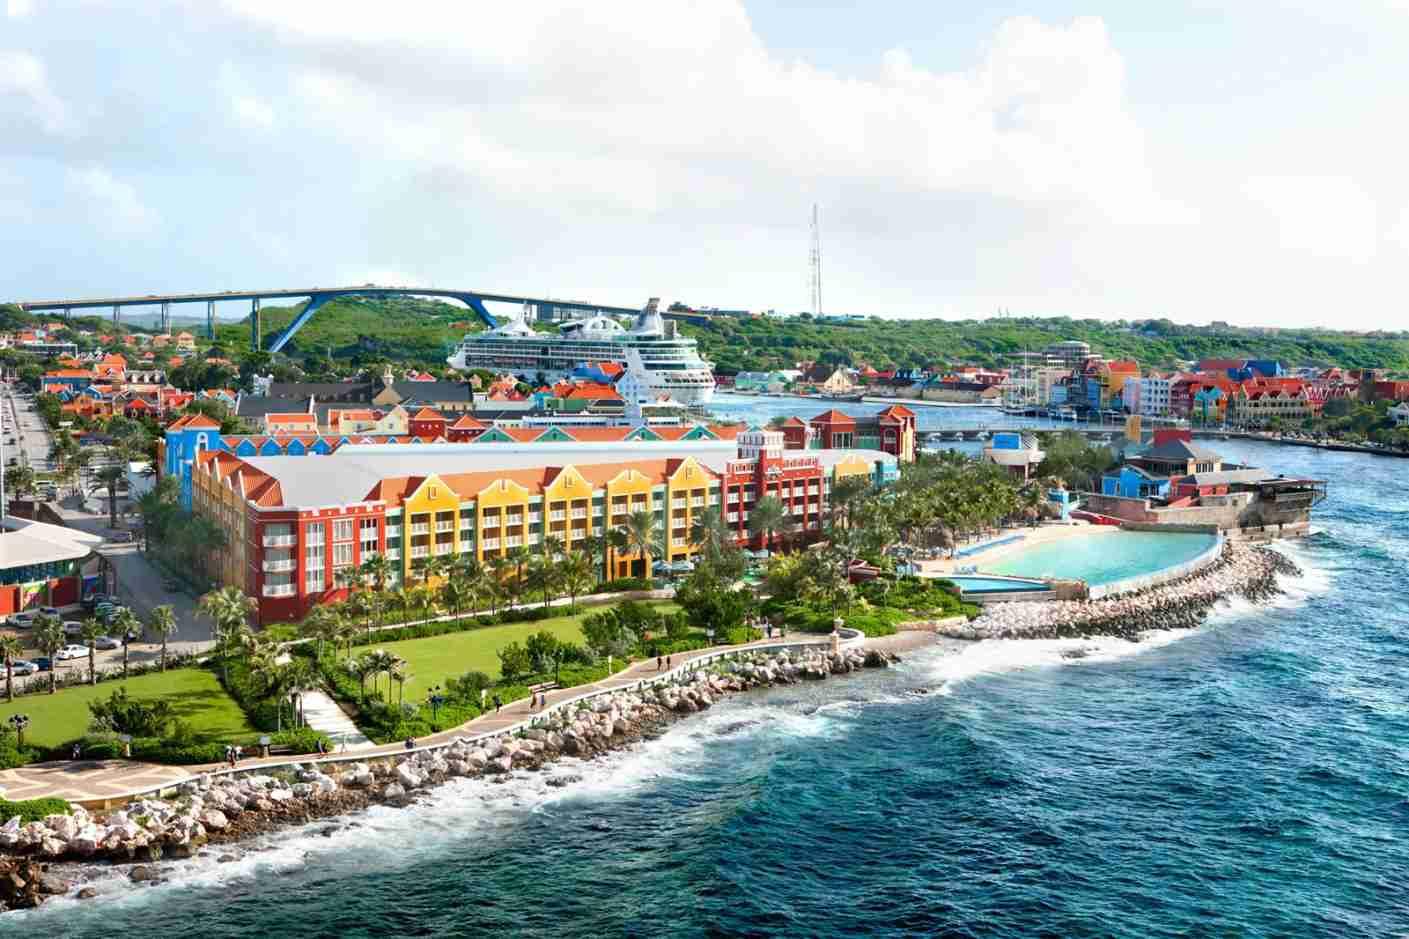 The RenaissanceCuraçao Resort and Casino. (Photo courtesy of The Renaissance)